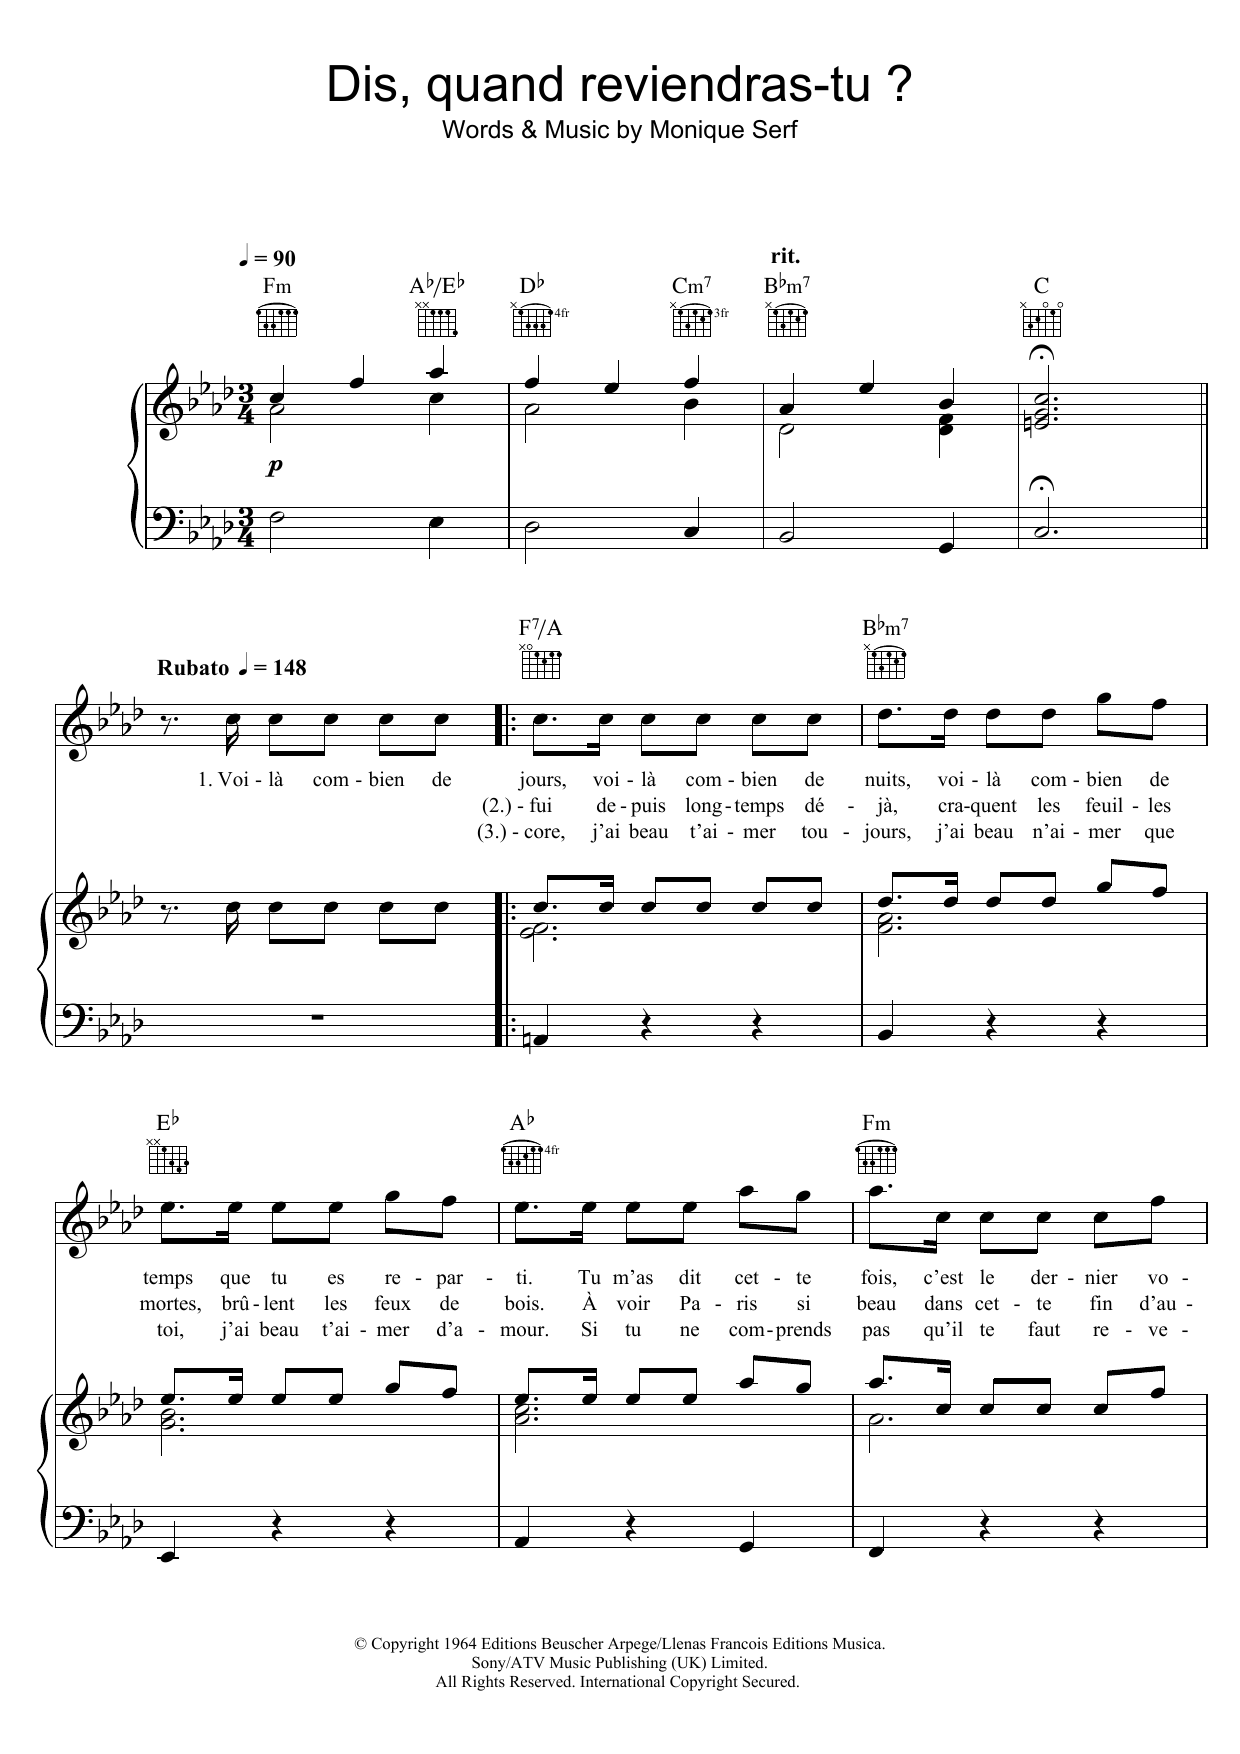 Dis, Quand Reviendras Tu ? sheet music